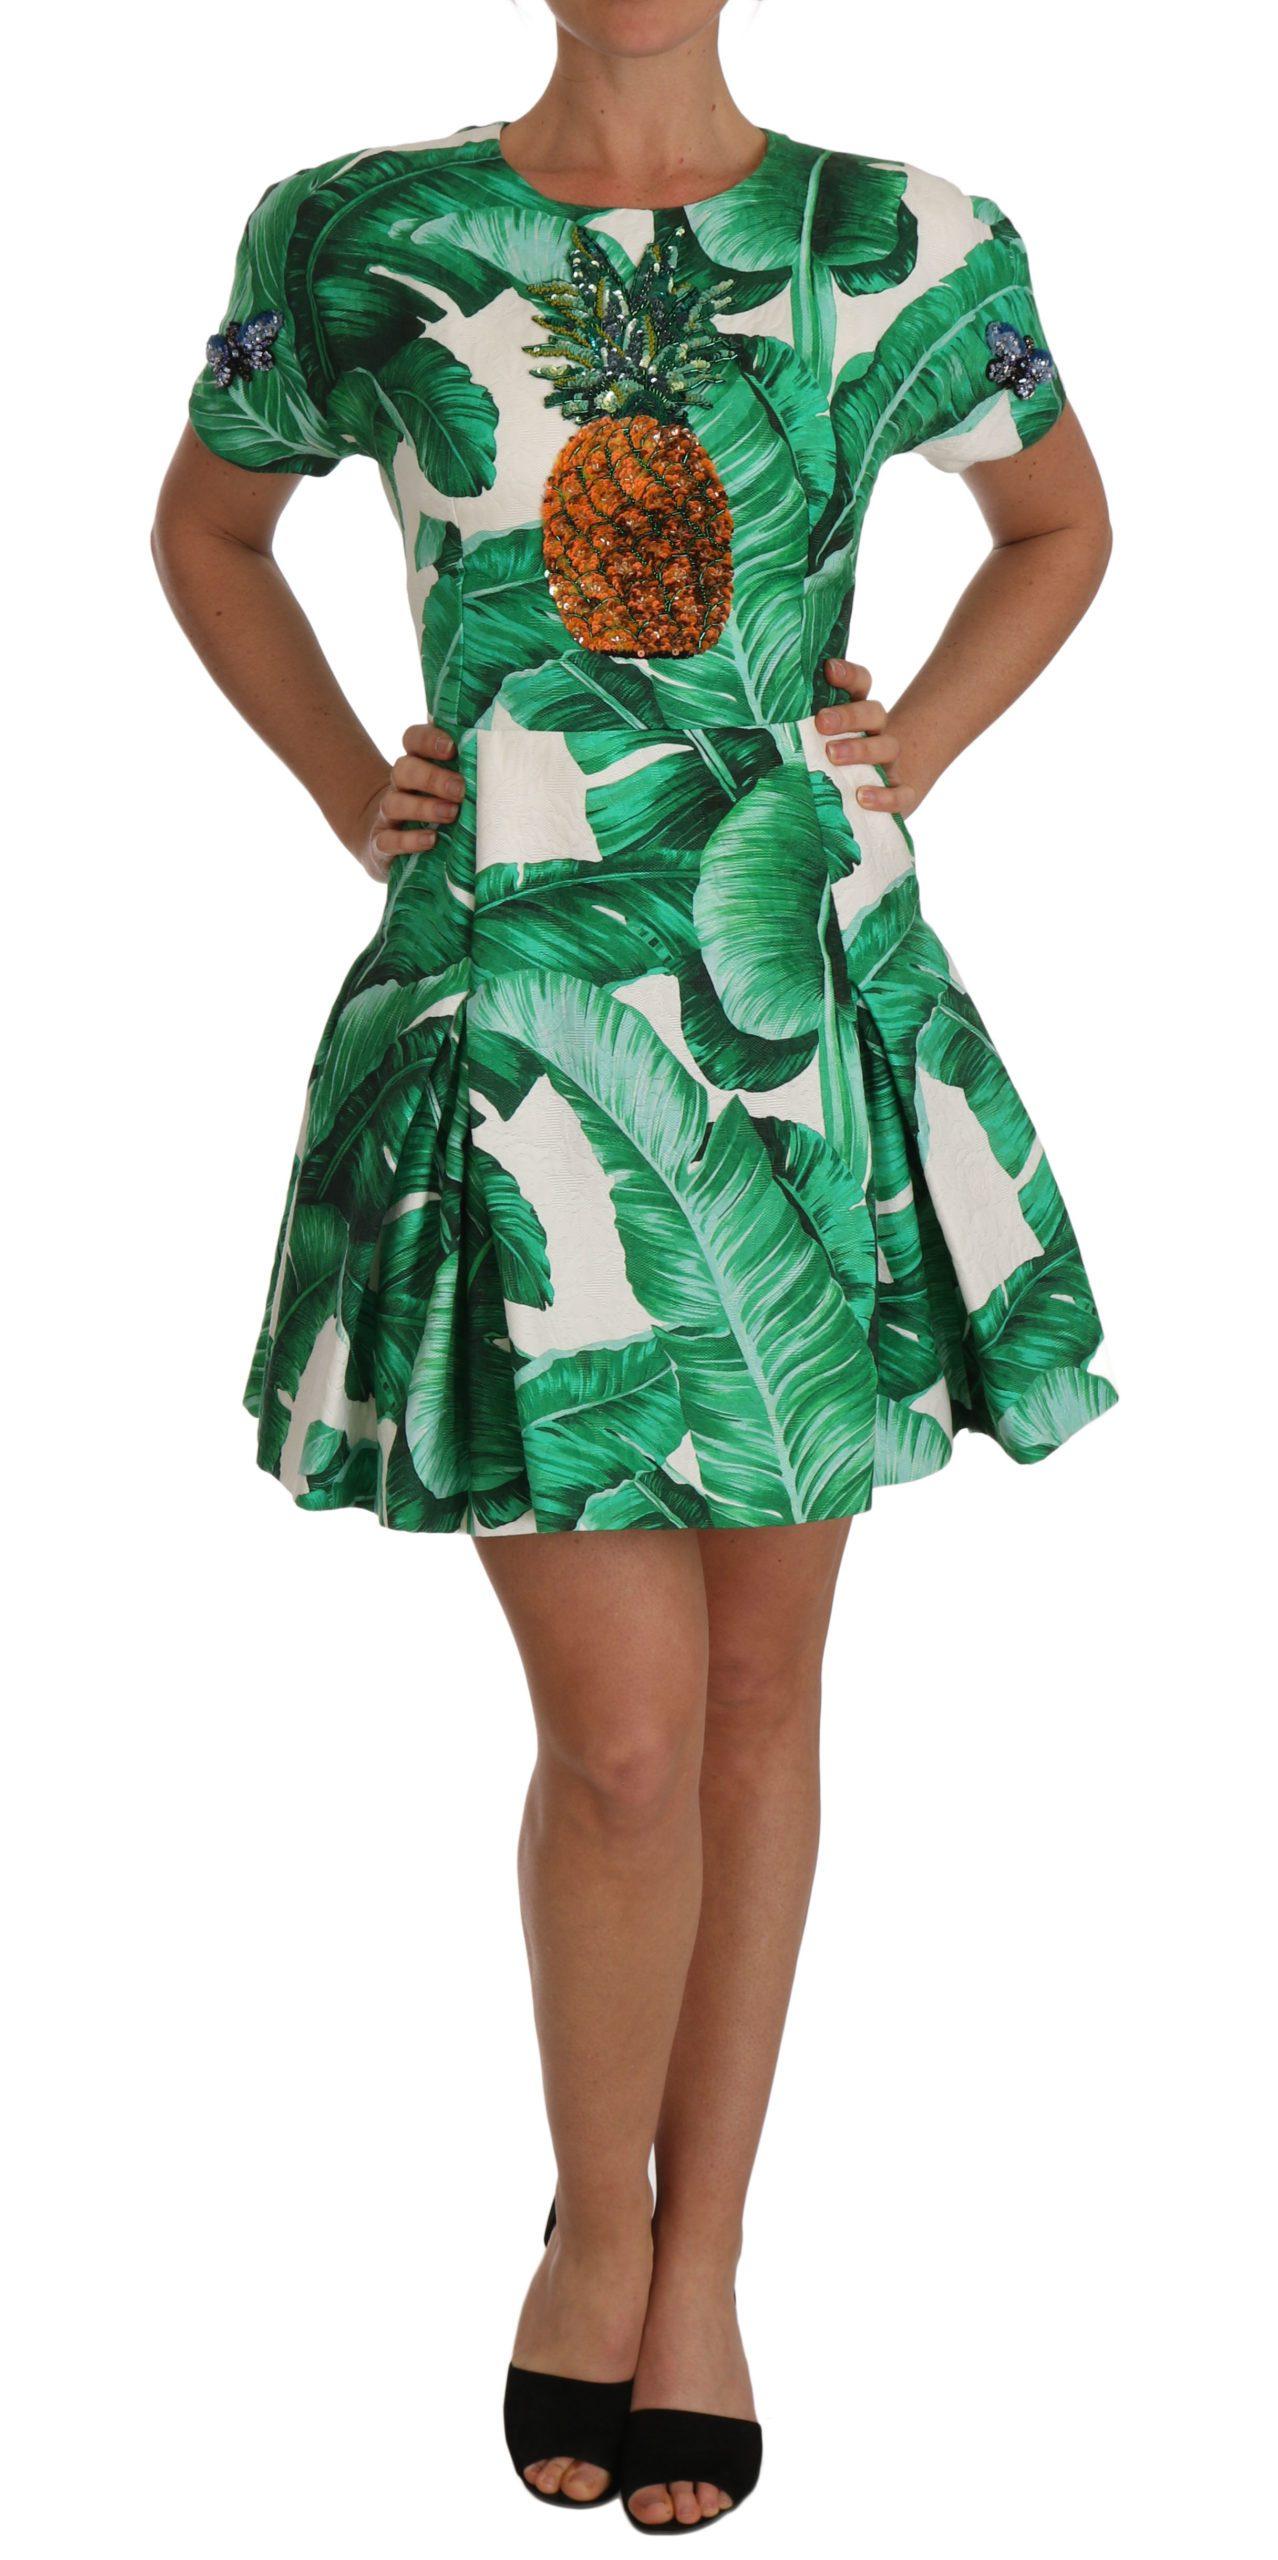 Dolce & Gabbana Women's A-Line Crystal Dress Green DR1429 - IT42 M